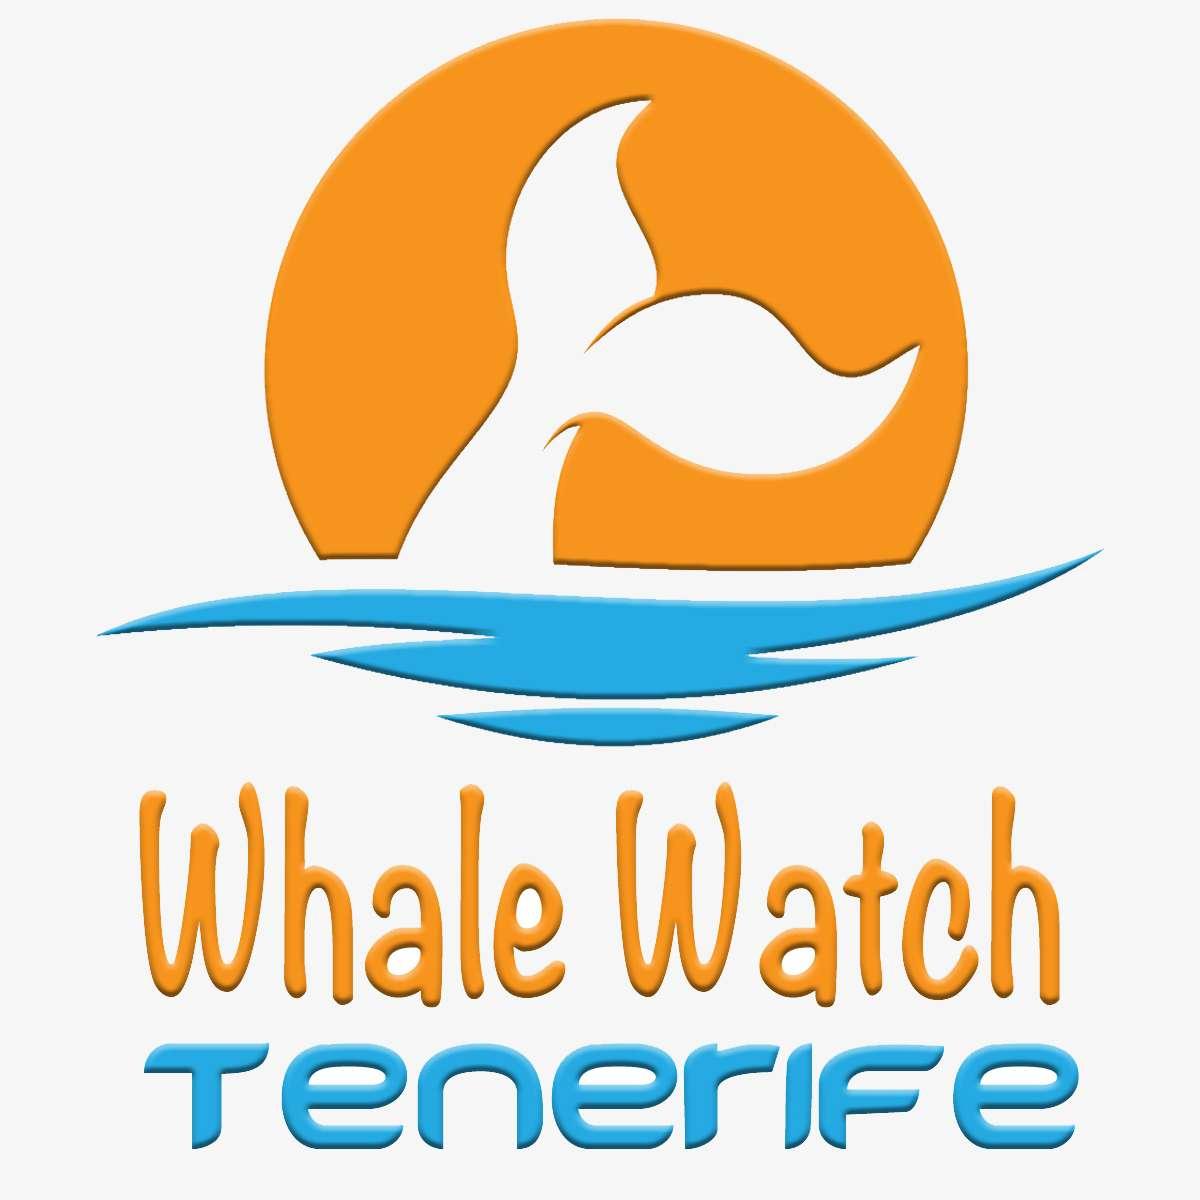 Whale Watch Tenerife WCA Logo